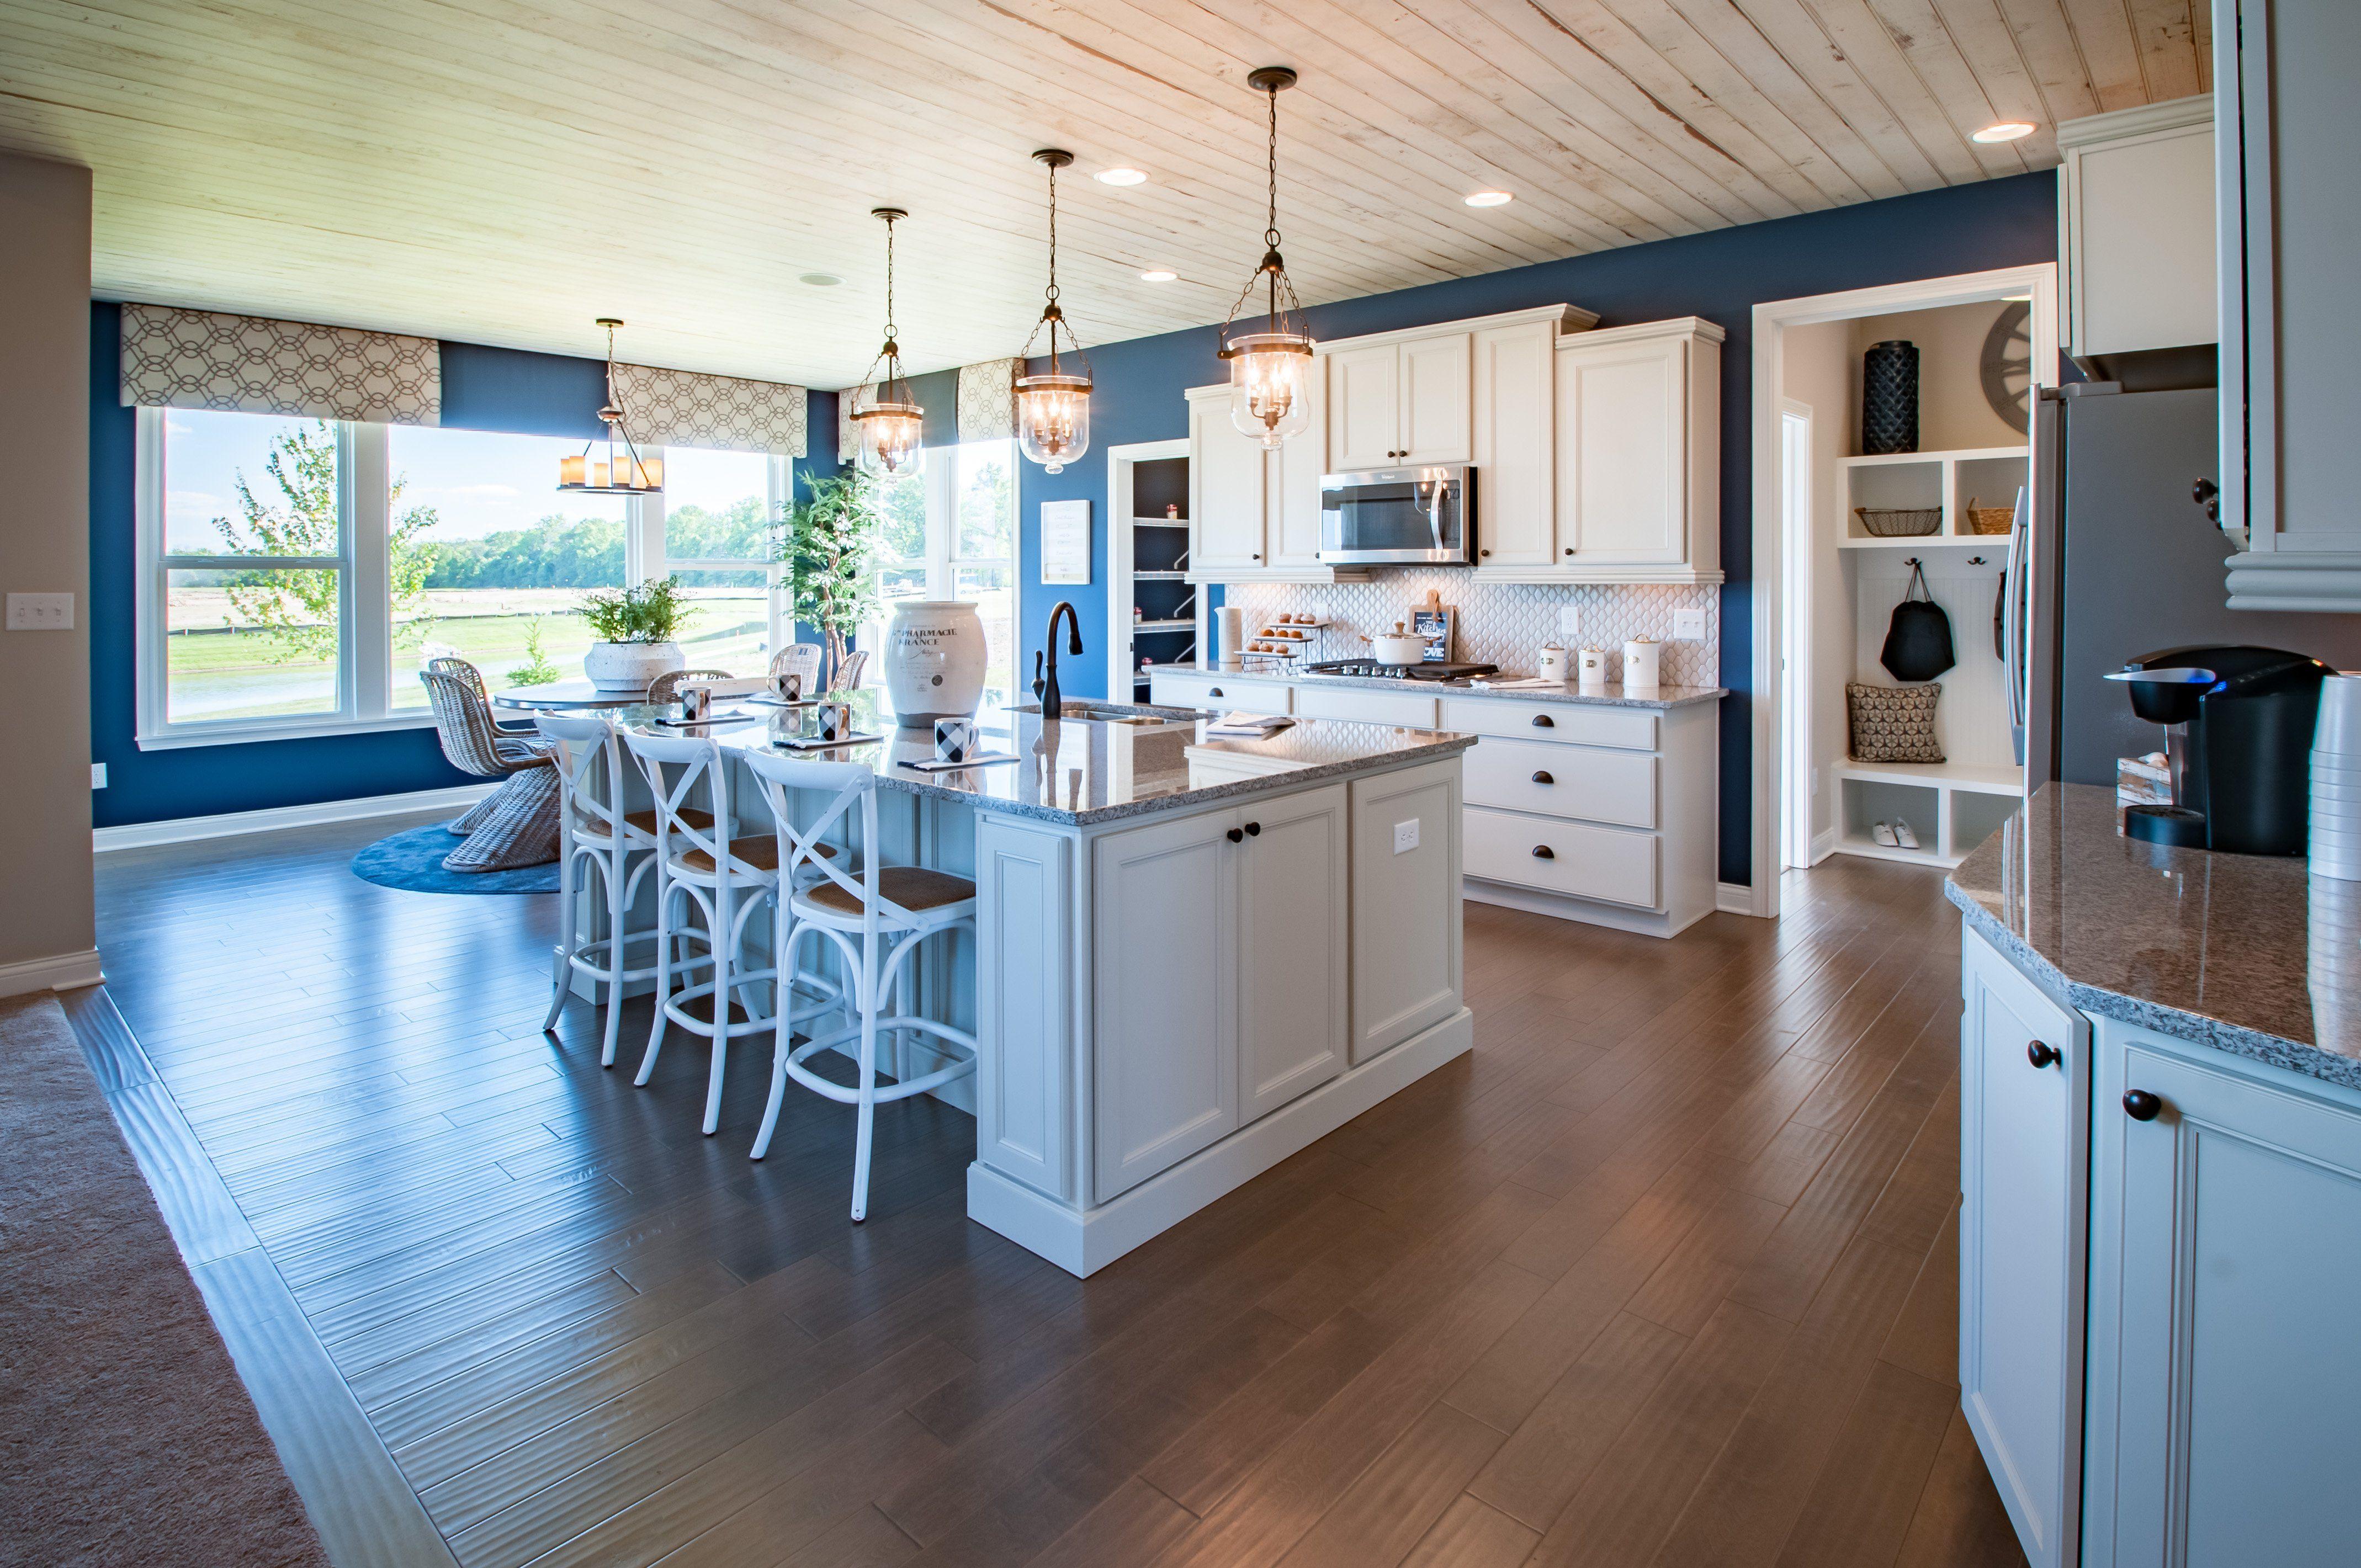 Fischer Homes Cincinnati OH Communities & Homes for Sale | NewHomeSource